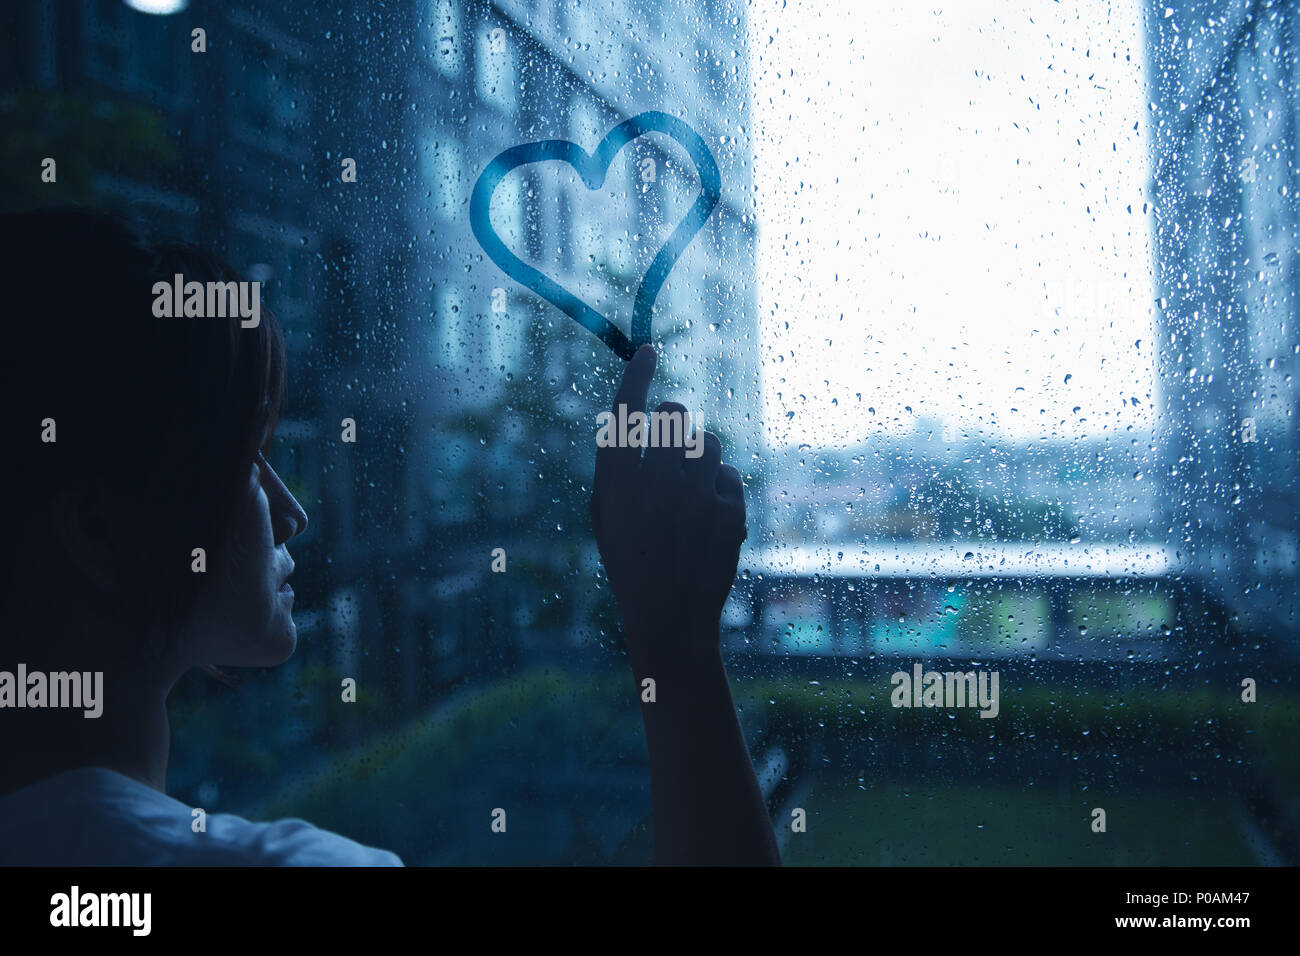 Triste amor mujer solitaria en la lluvia dibujar en windows Corazón Cristal tono azul oscuro Imagen De Stock